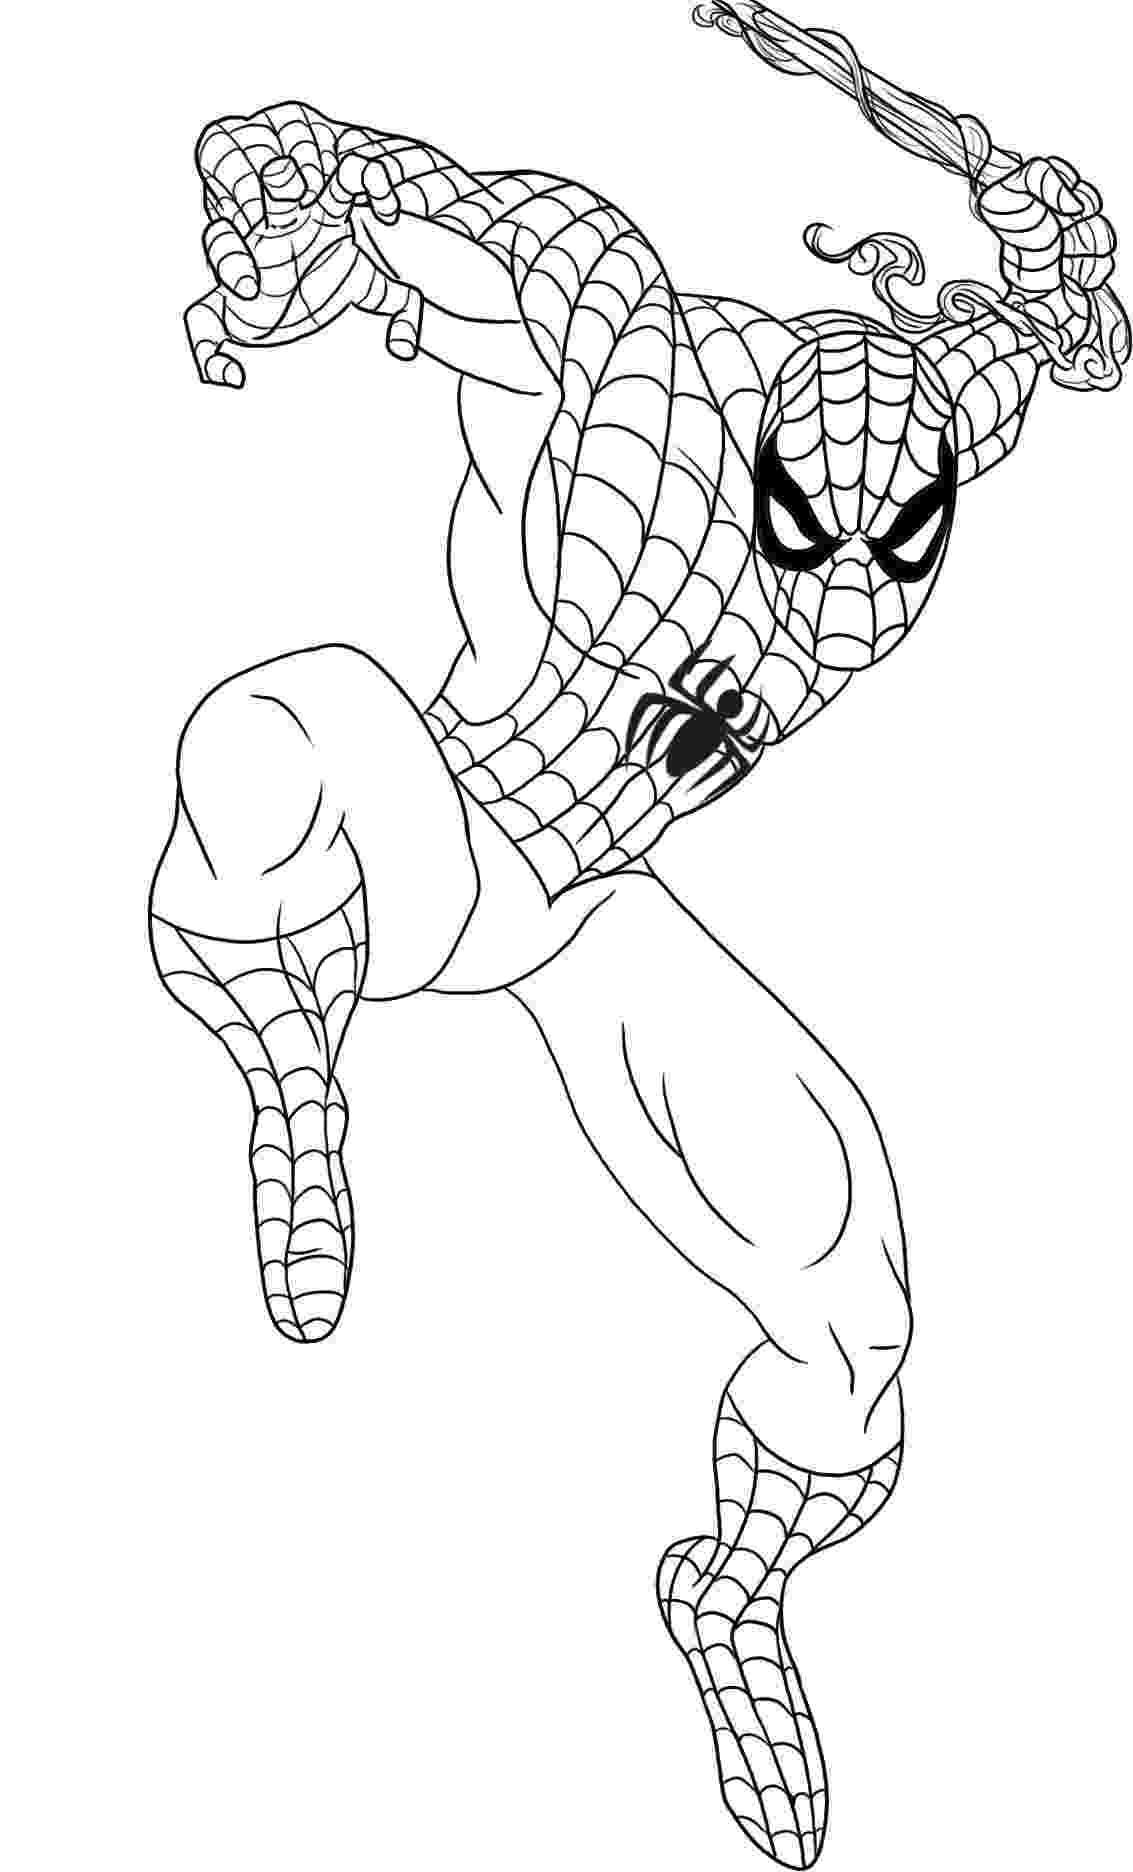 spider man coloring sheet print download spiderman coloring pages an enjoyable coloring spider man sheet